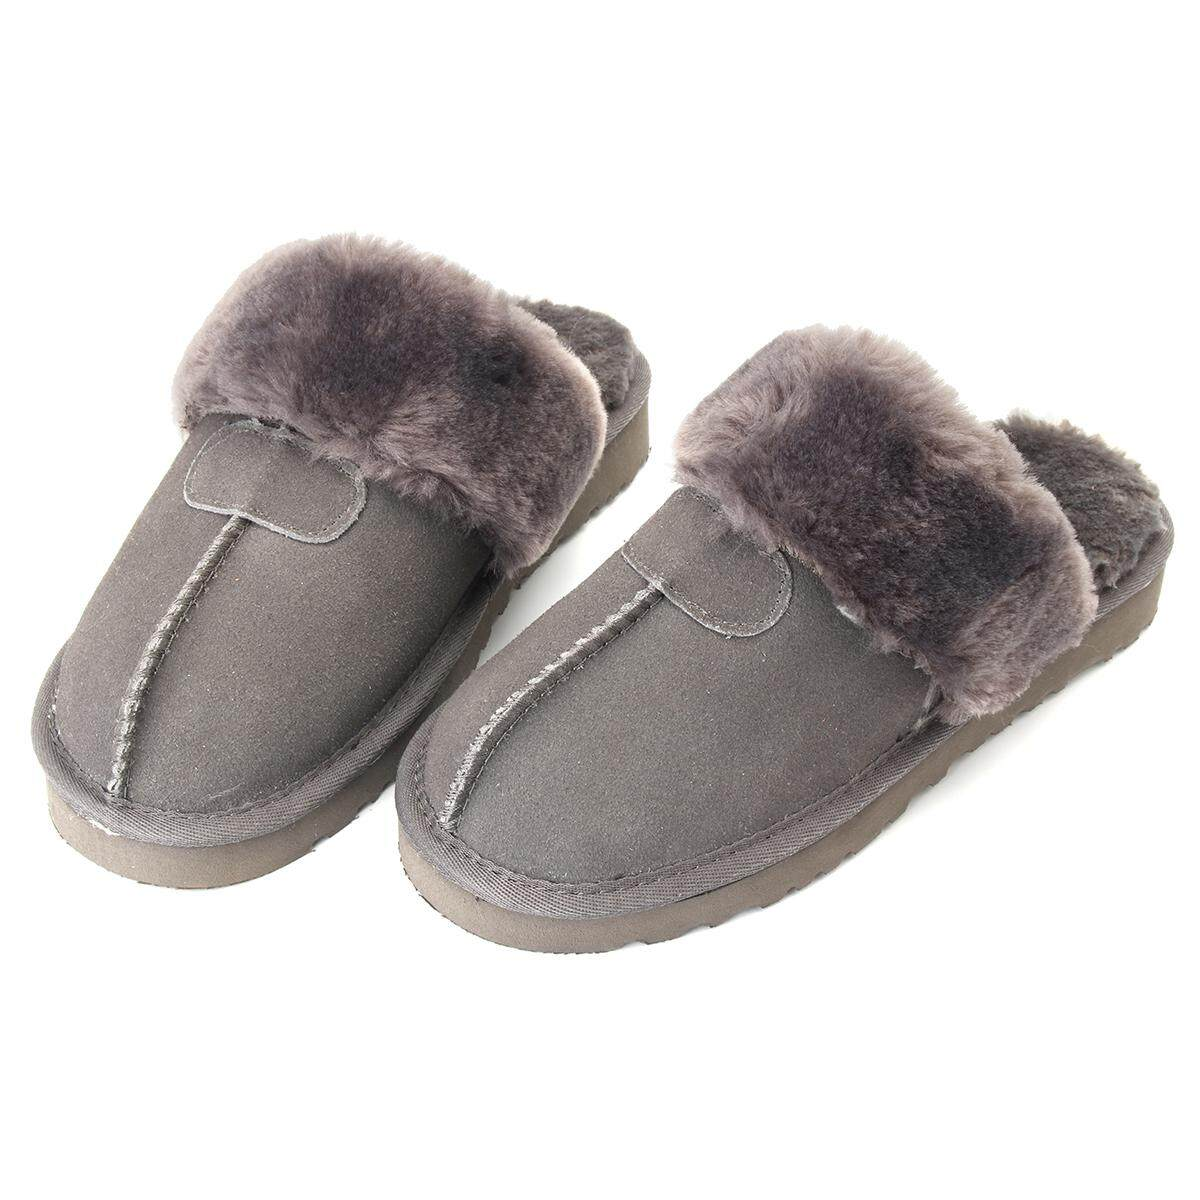 206452e86d981 Women Winter Natural Sheepskin Fur Slippers Warm Indoor Wool Home Shoes  Soft New - intl